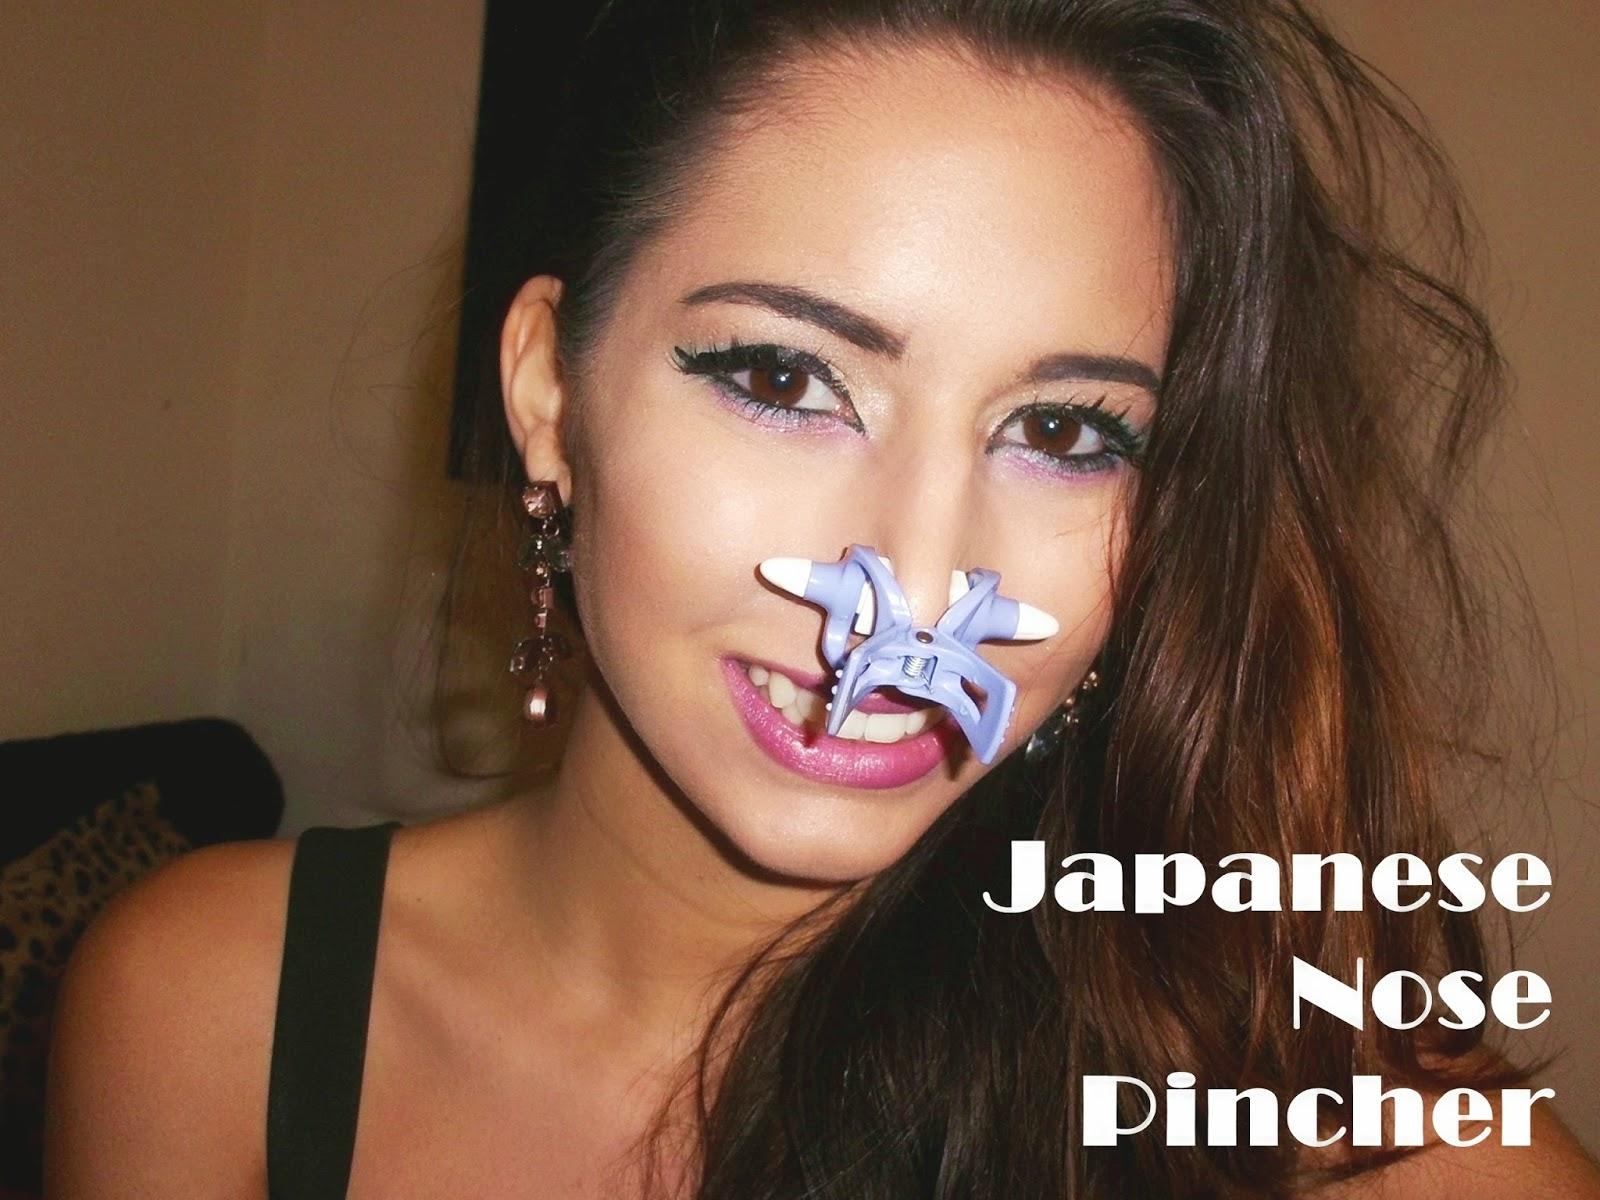 Nose Pincher Golfclub Jiahe Up Japanese 50 Elasticos